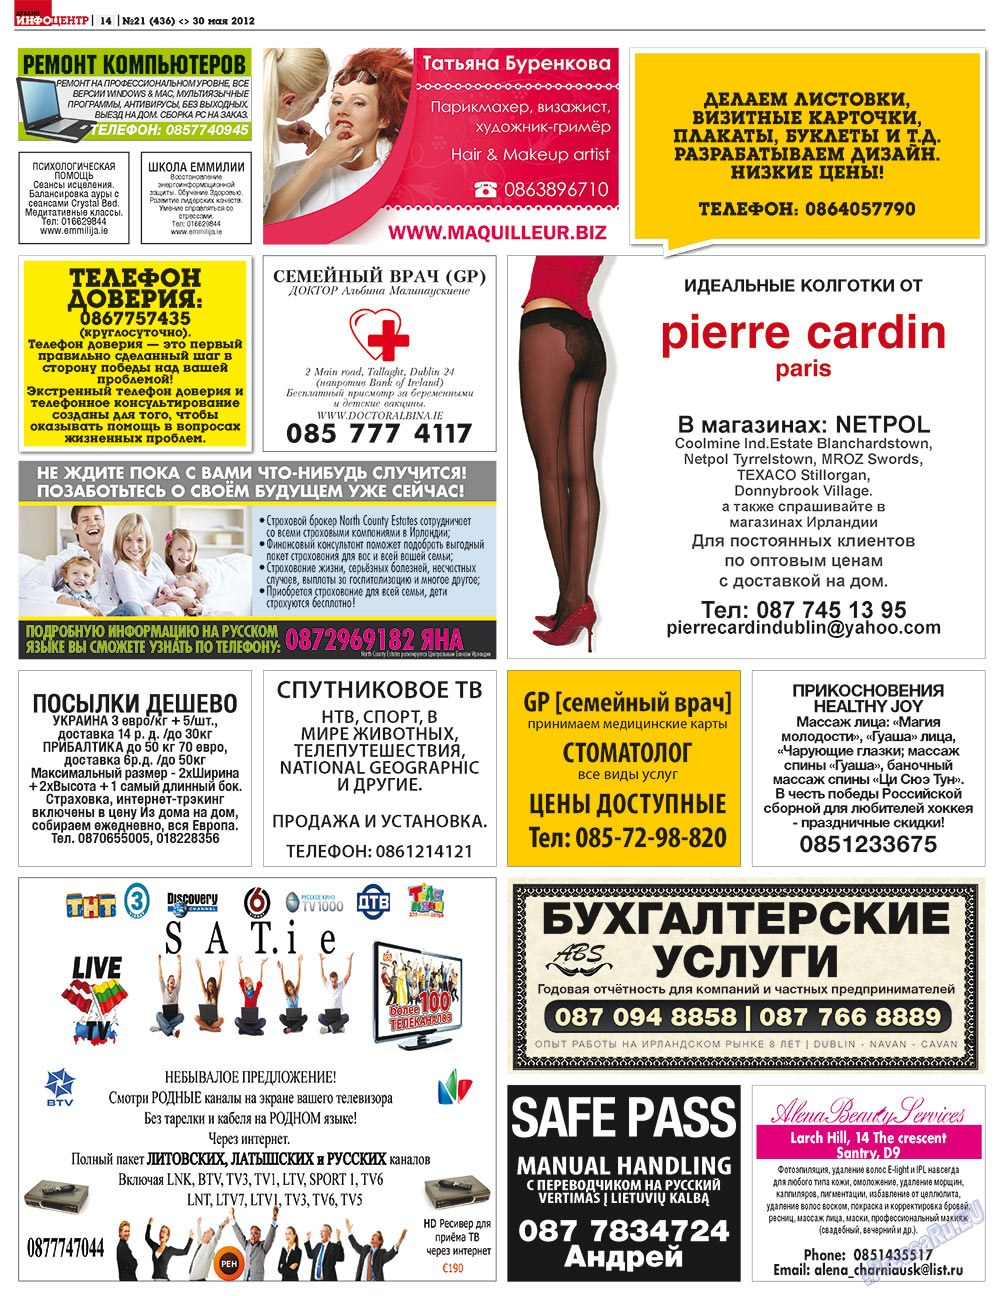 Дублин инфоцентр (газета). 2012 год, номер 21, стр. 14